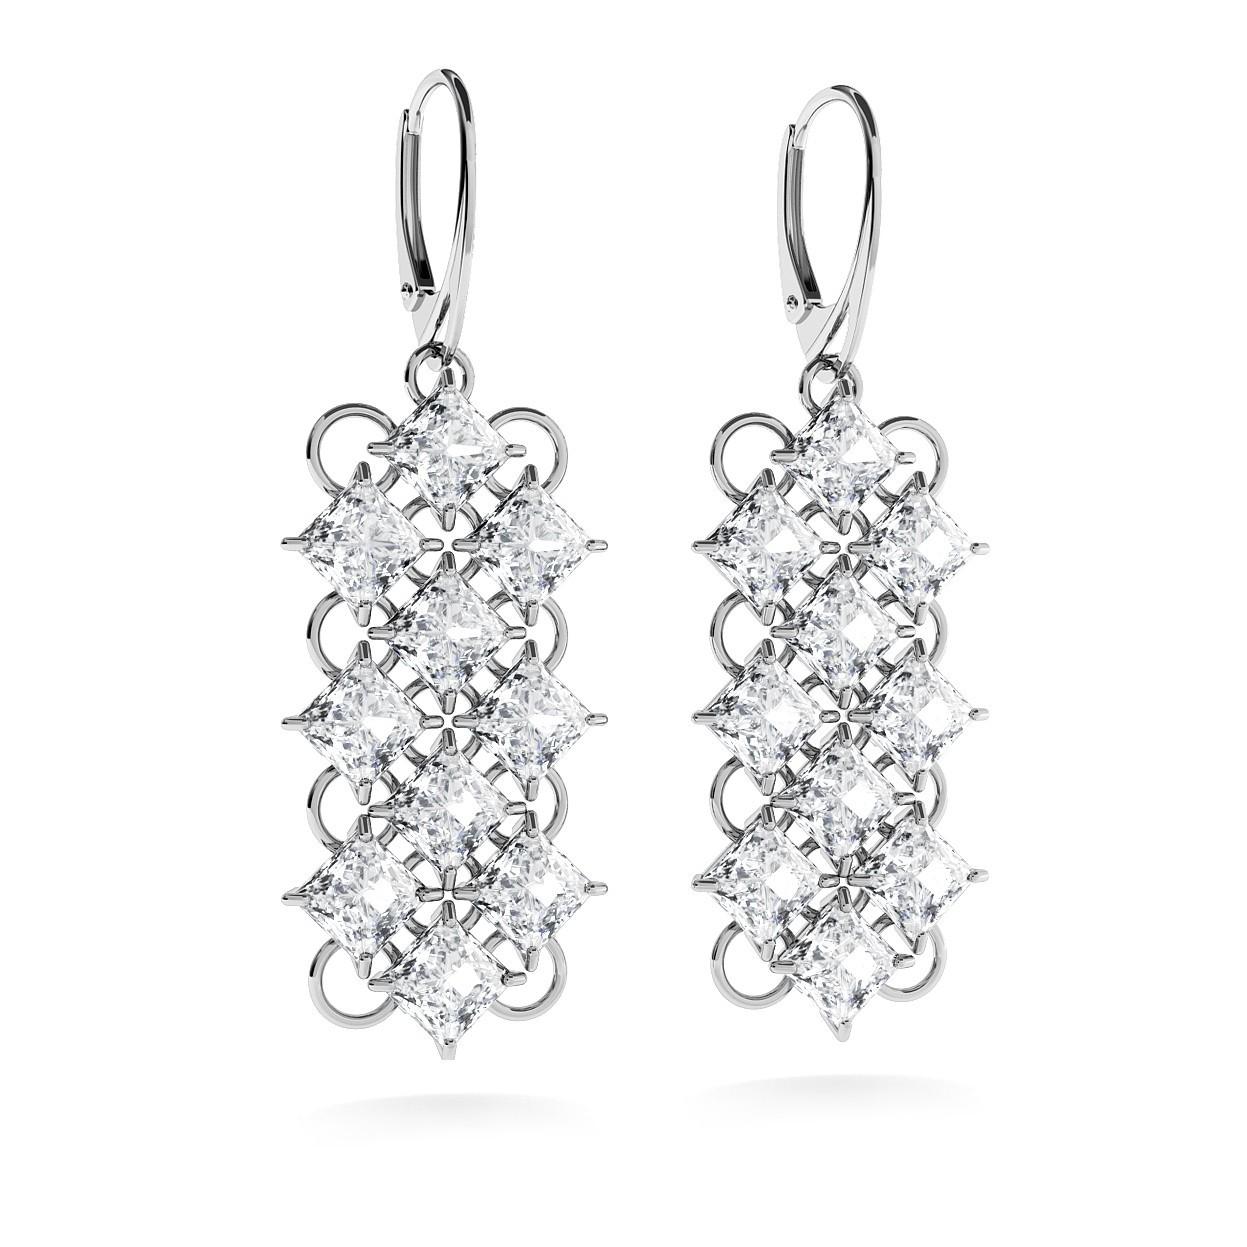 Luxus Ohrringe mit Zirkonen, Hochzeitsschmuck - MODEL 2